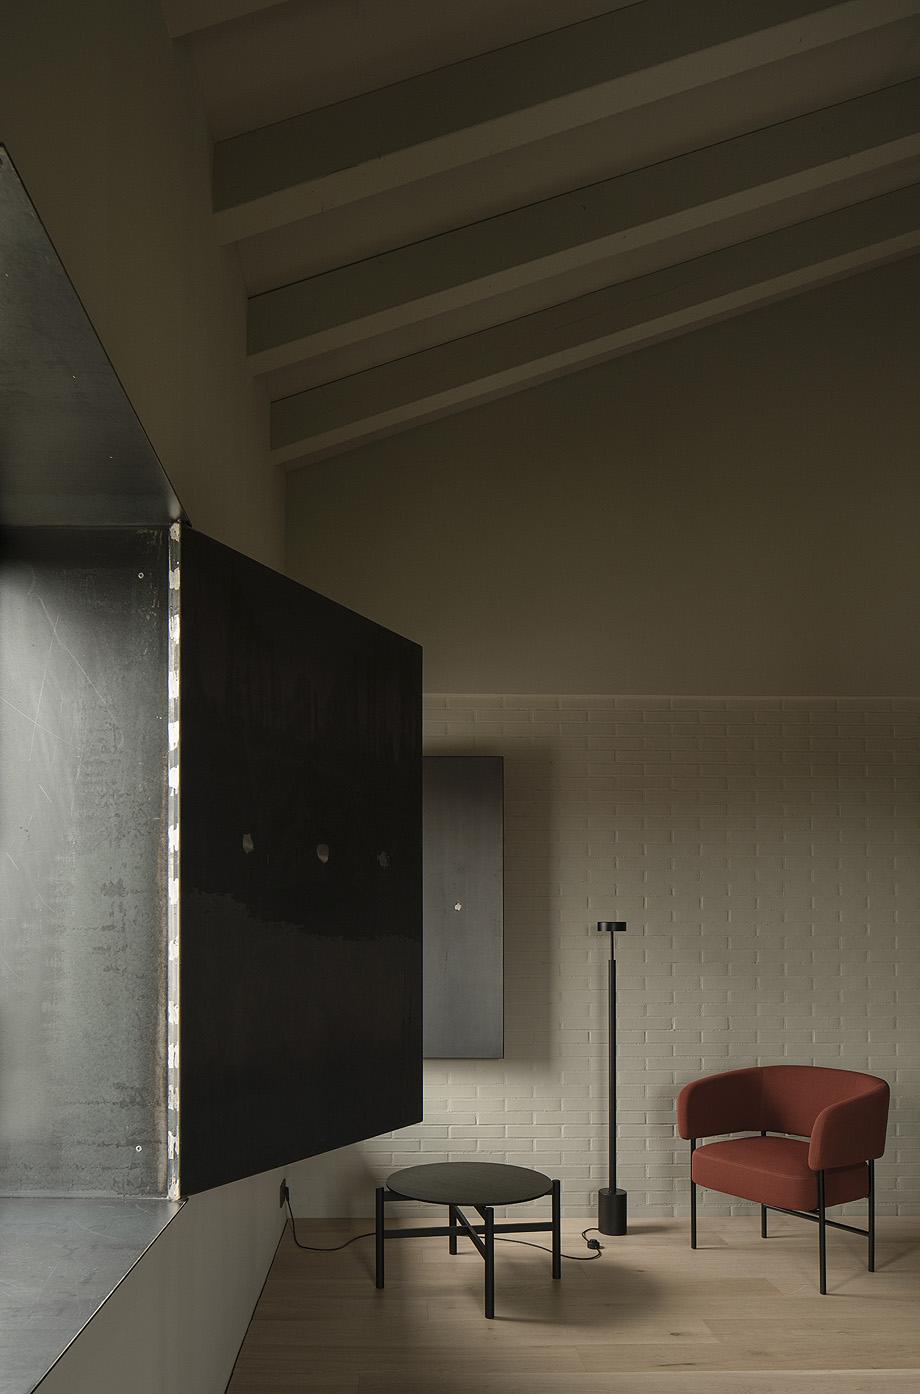 casa grande hotel de francesc rife (12) - foto david zarzoso